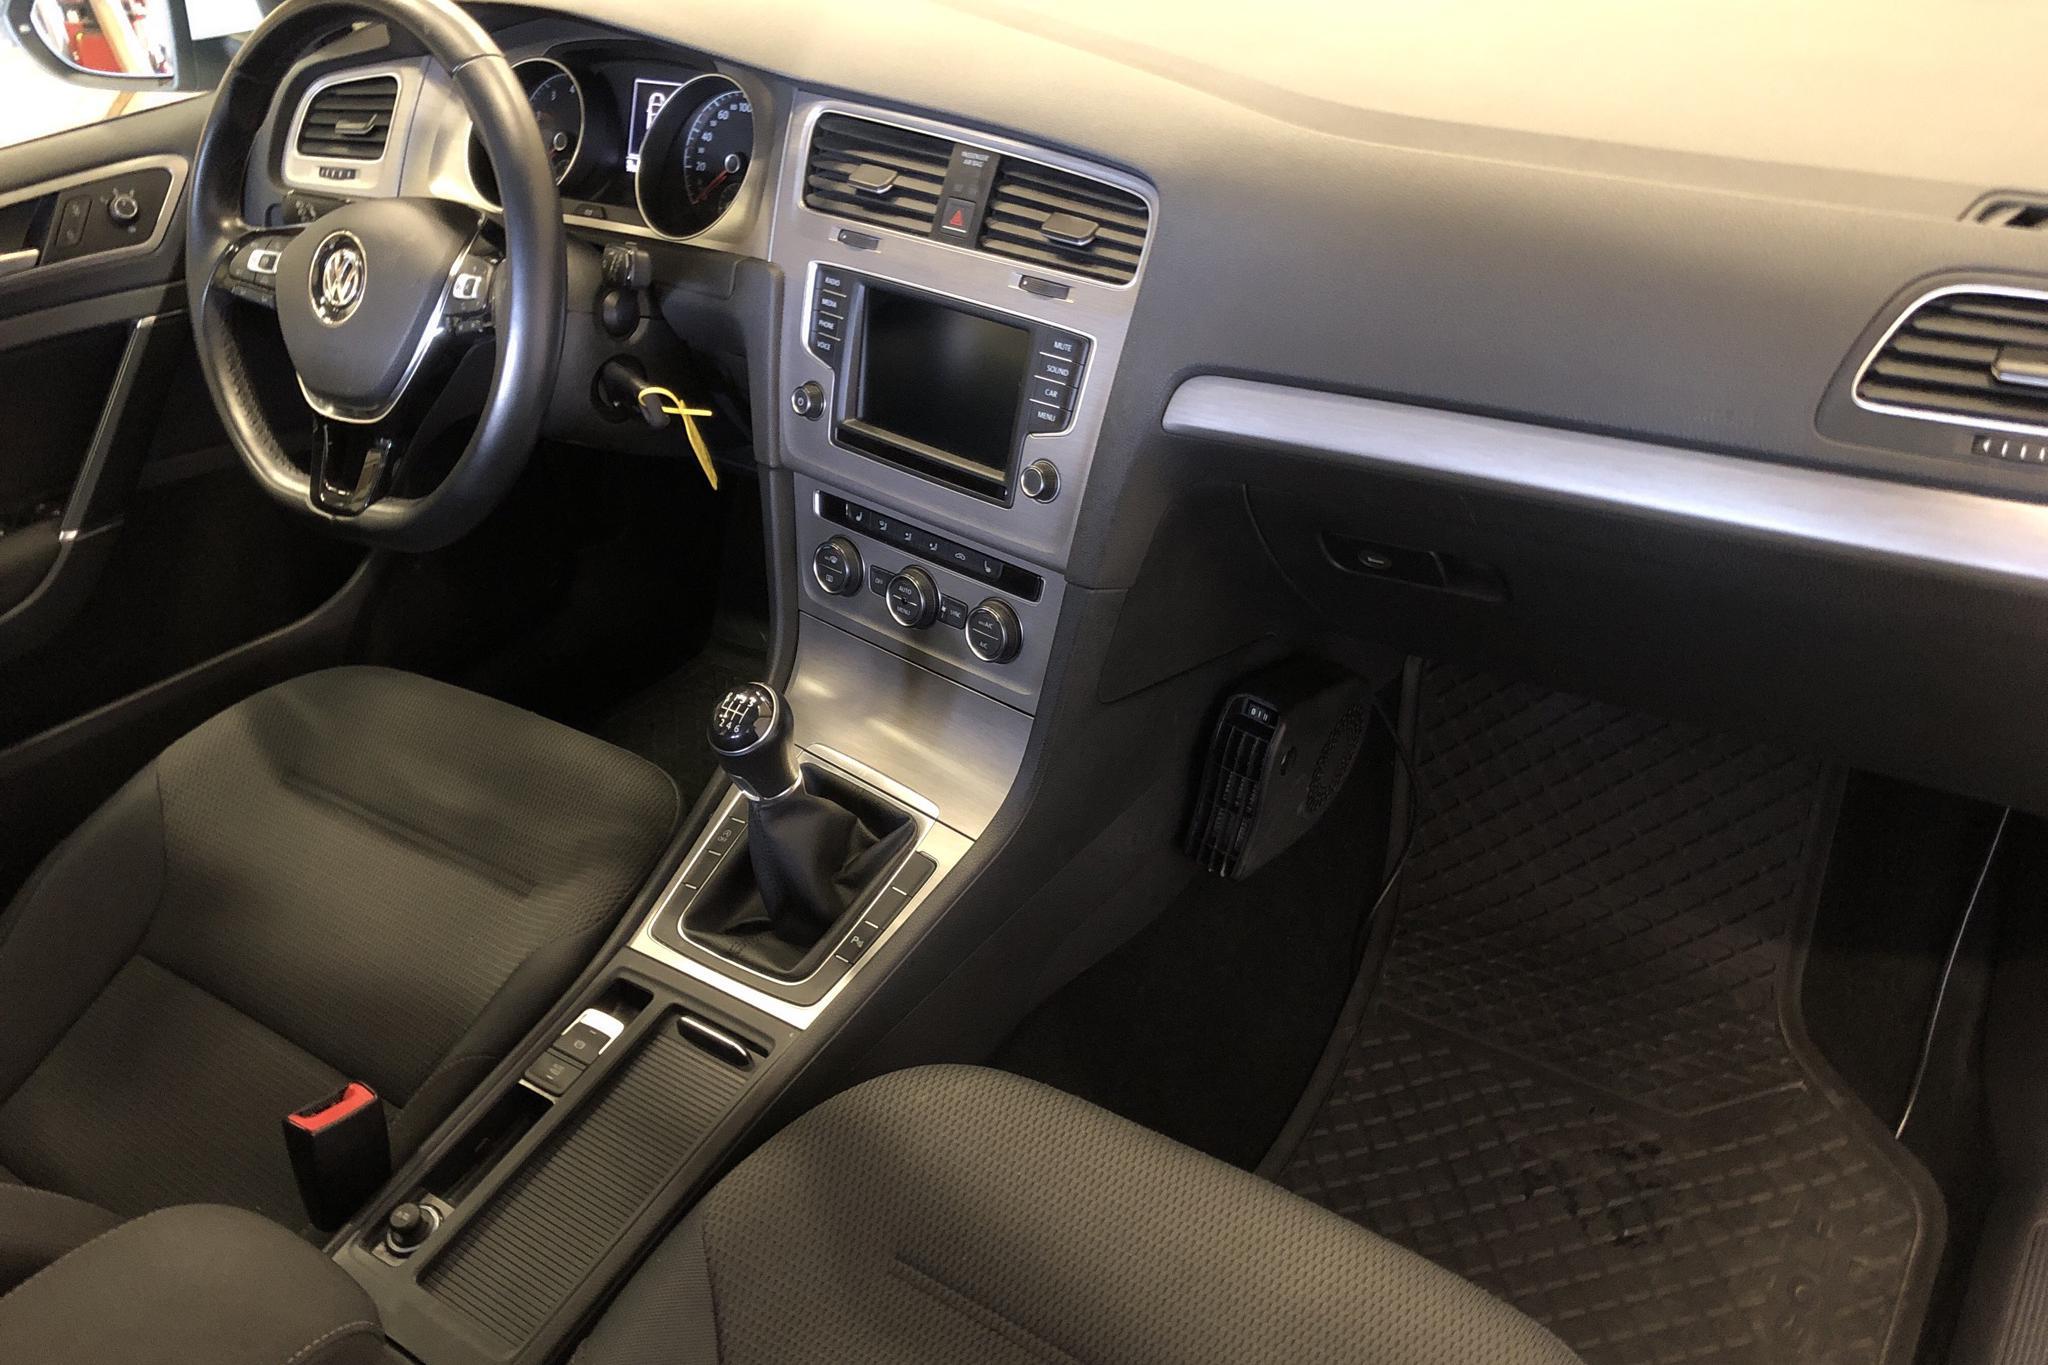 VW Golf VII 1.4 TSI Multifuel Sportscombi (125hk) - 57 380 km - Manual - white - 2016